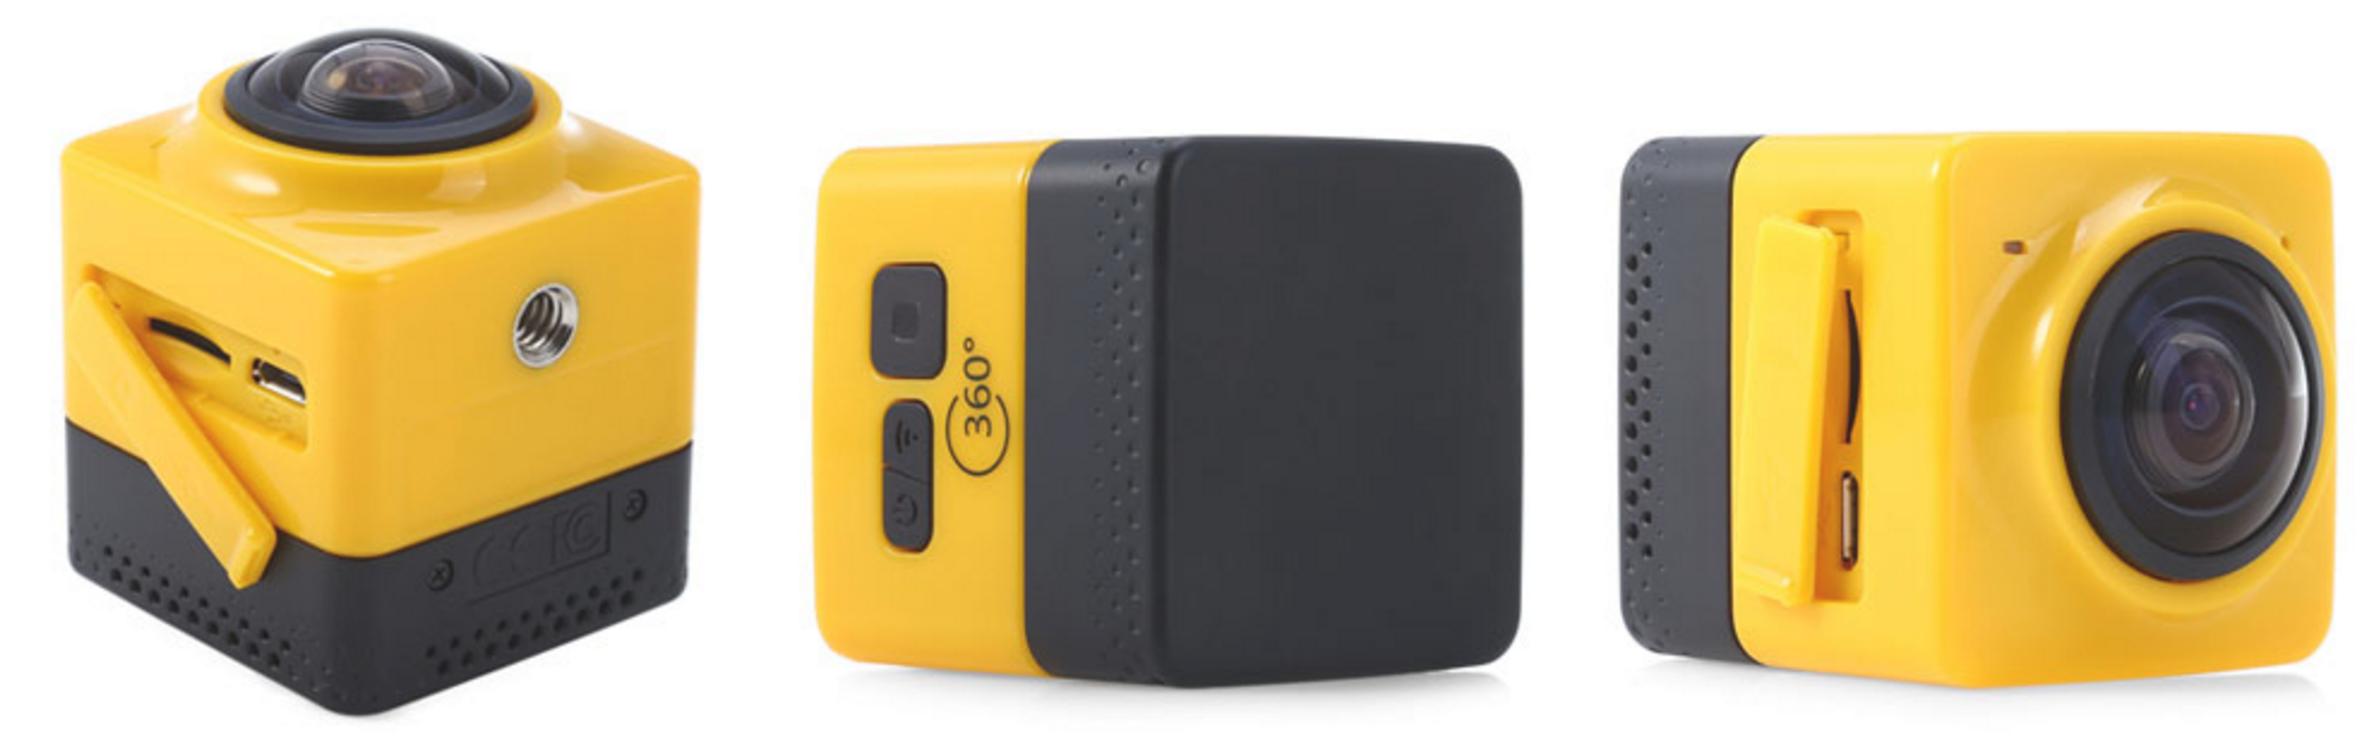 Cube 360 Kamera 1